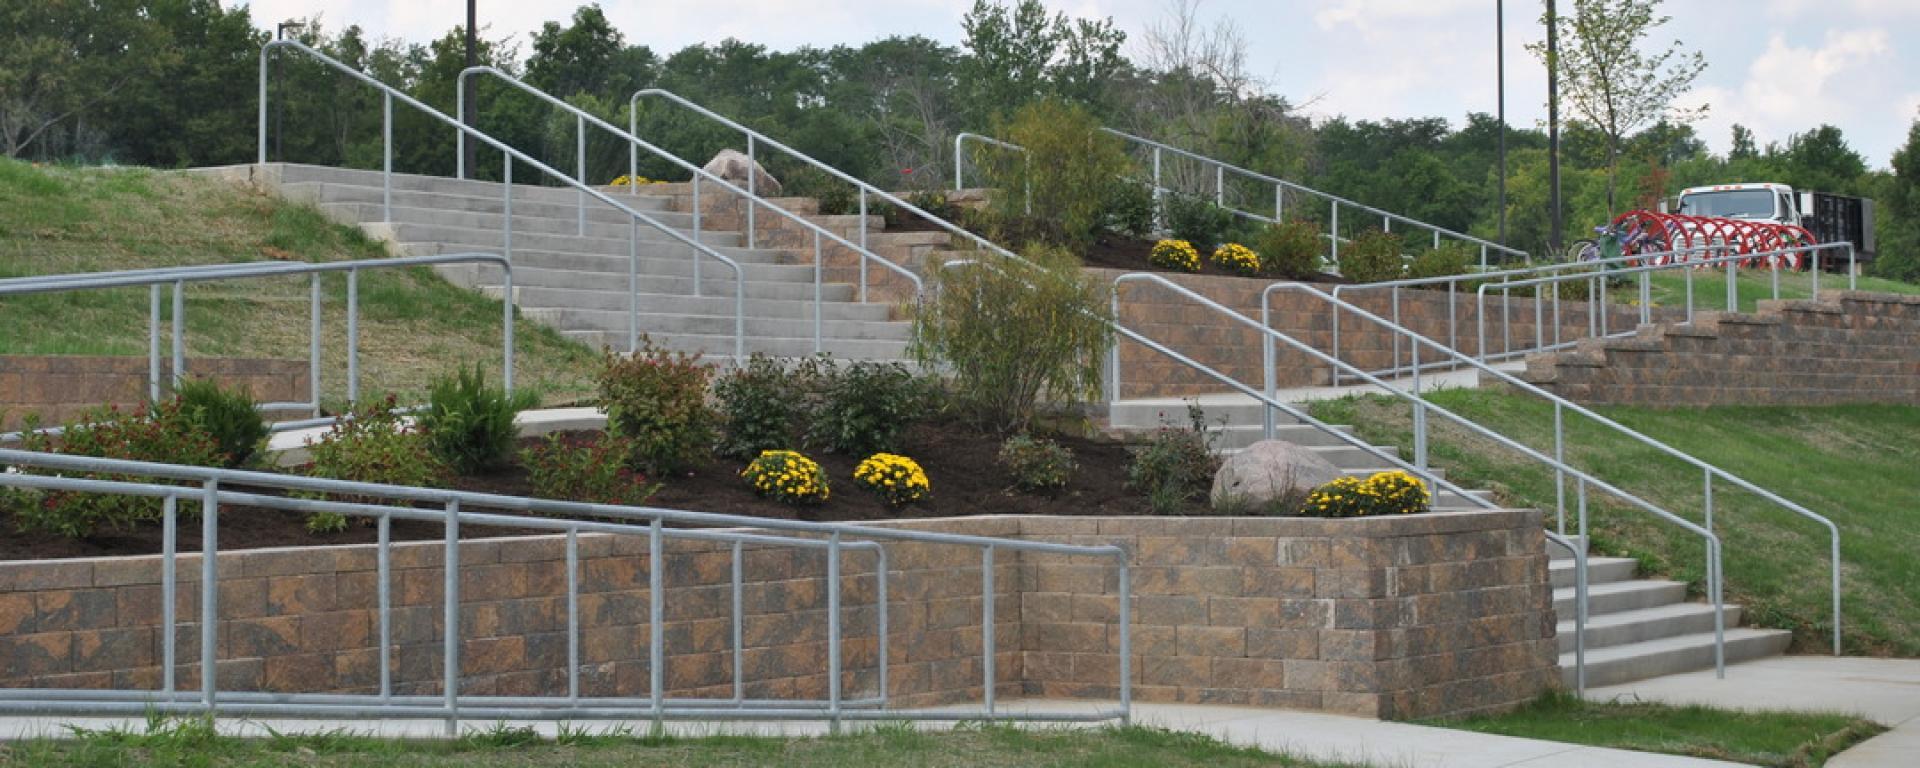 Landscape view of Kramer Elementary